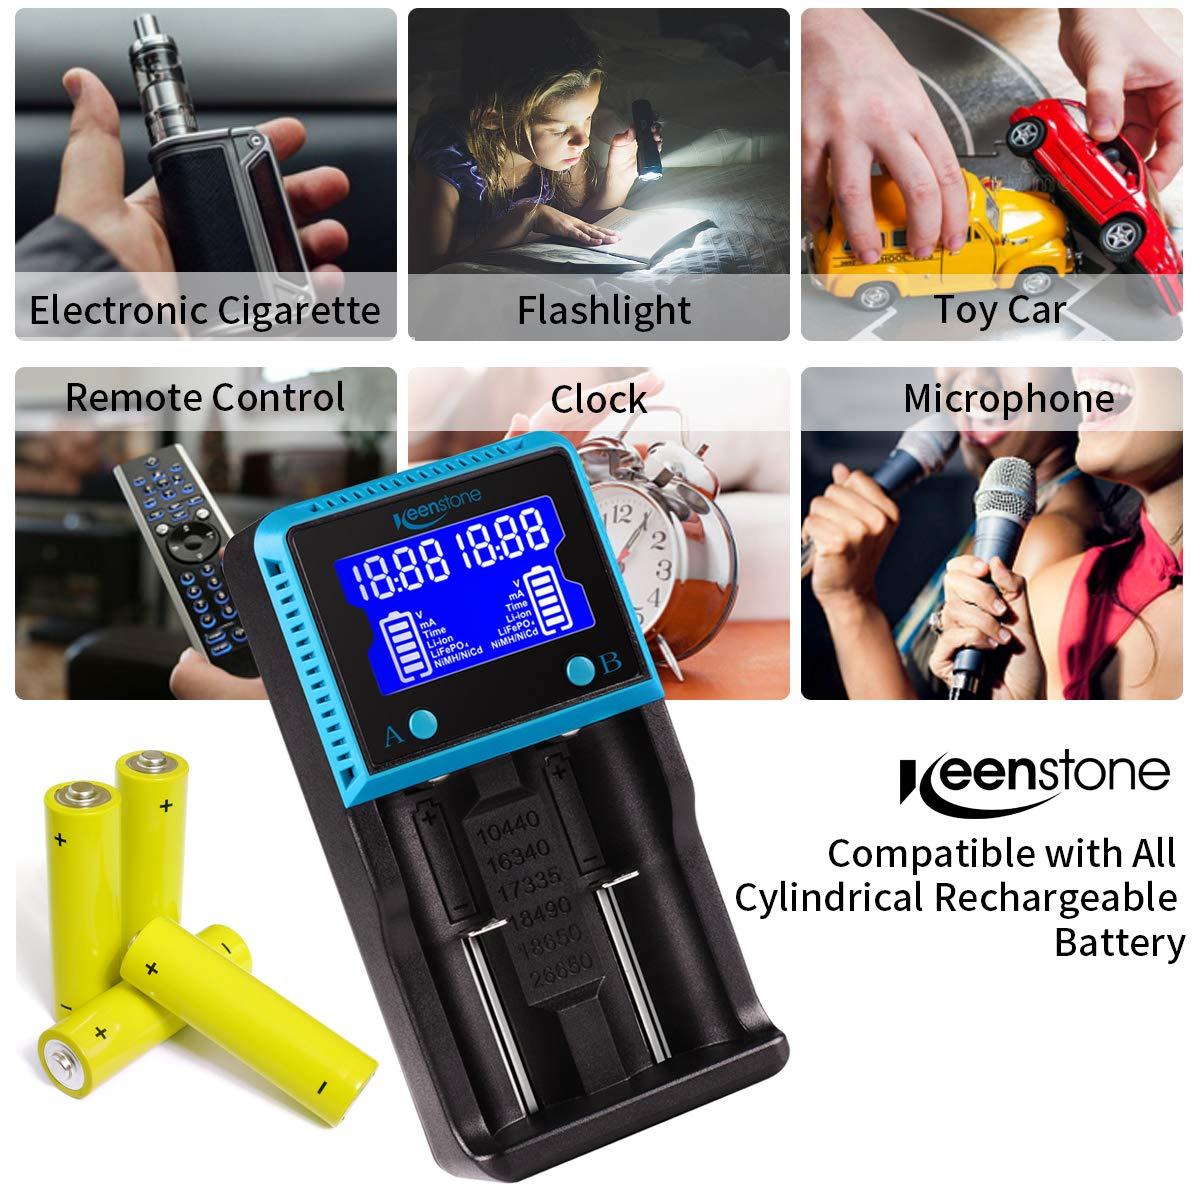 Caricabatteria universale, Keenstone 2 Slot Intellicharge con Display LCD, Adatto per batterie ricaricabili Ni-MH Ni-Cd AA AAA Li-ion LiFePO4 IMR 10440 14500 16340 18650 RCR123 26650